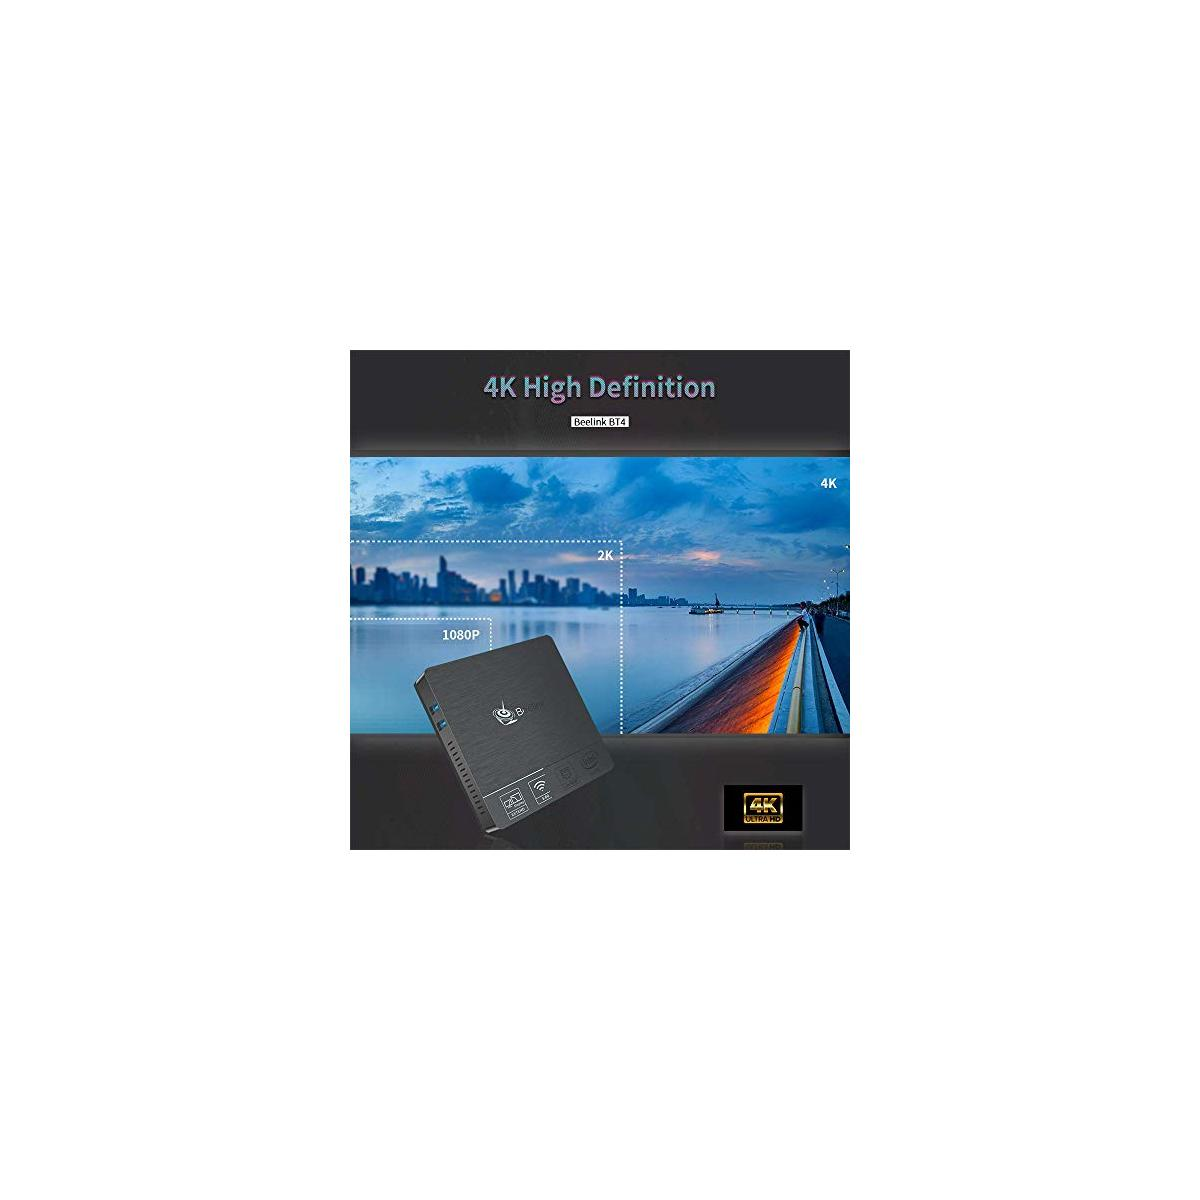 Beelink BT4 Mini PC Intel Atom Z8500 Windows 10 Mini Computer, 4GB DDR3L 64GB eMMC,Support 4K HD 30Hz,2.4/5G WiFi AC,Gigabit Ethernet, BT 4.0 (Beelink BT4 4GB/64GB)